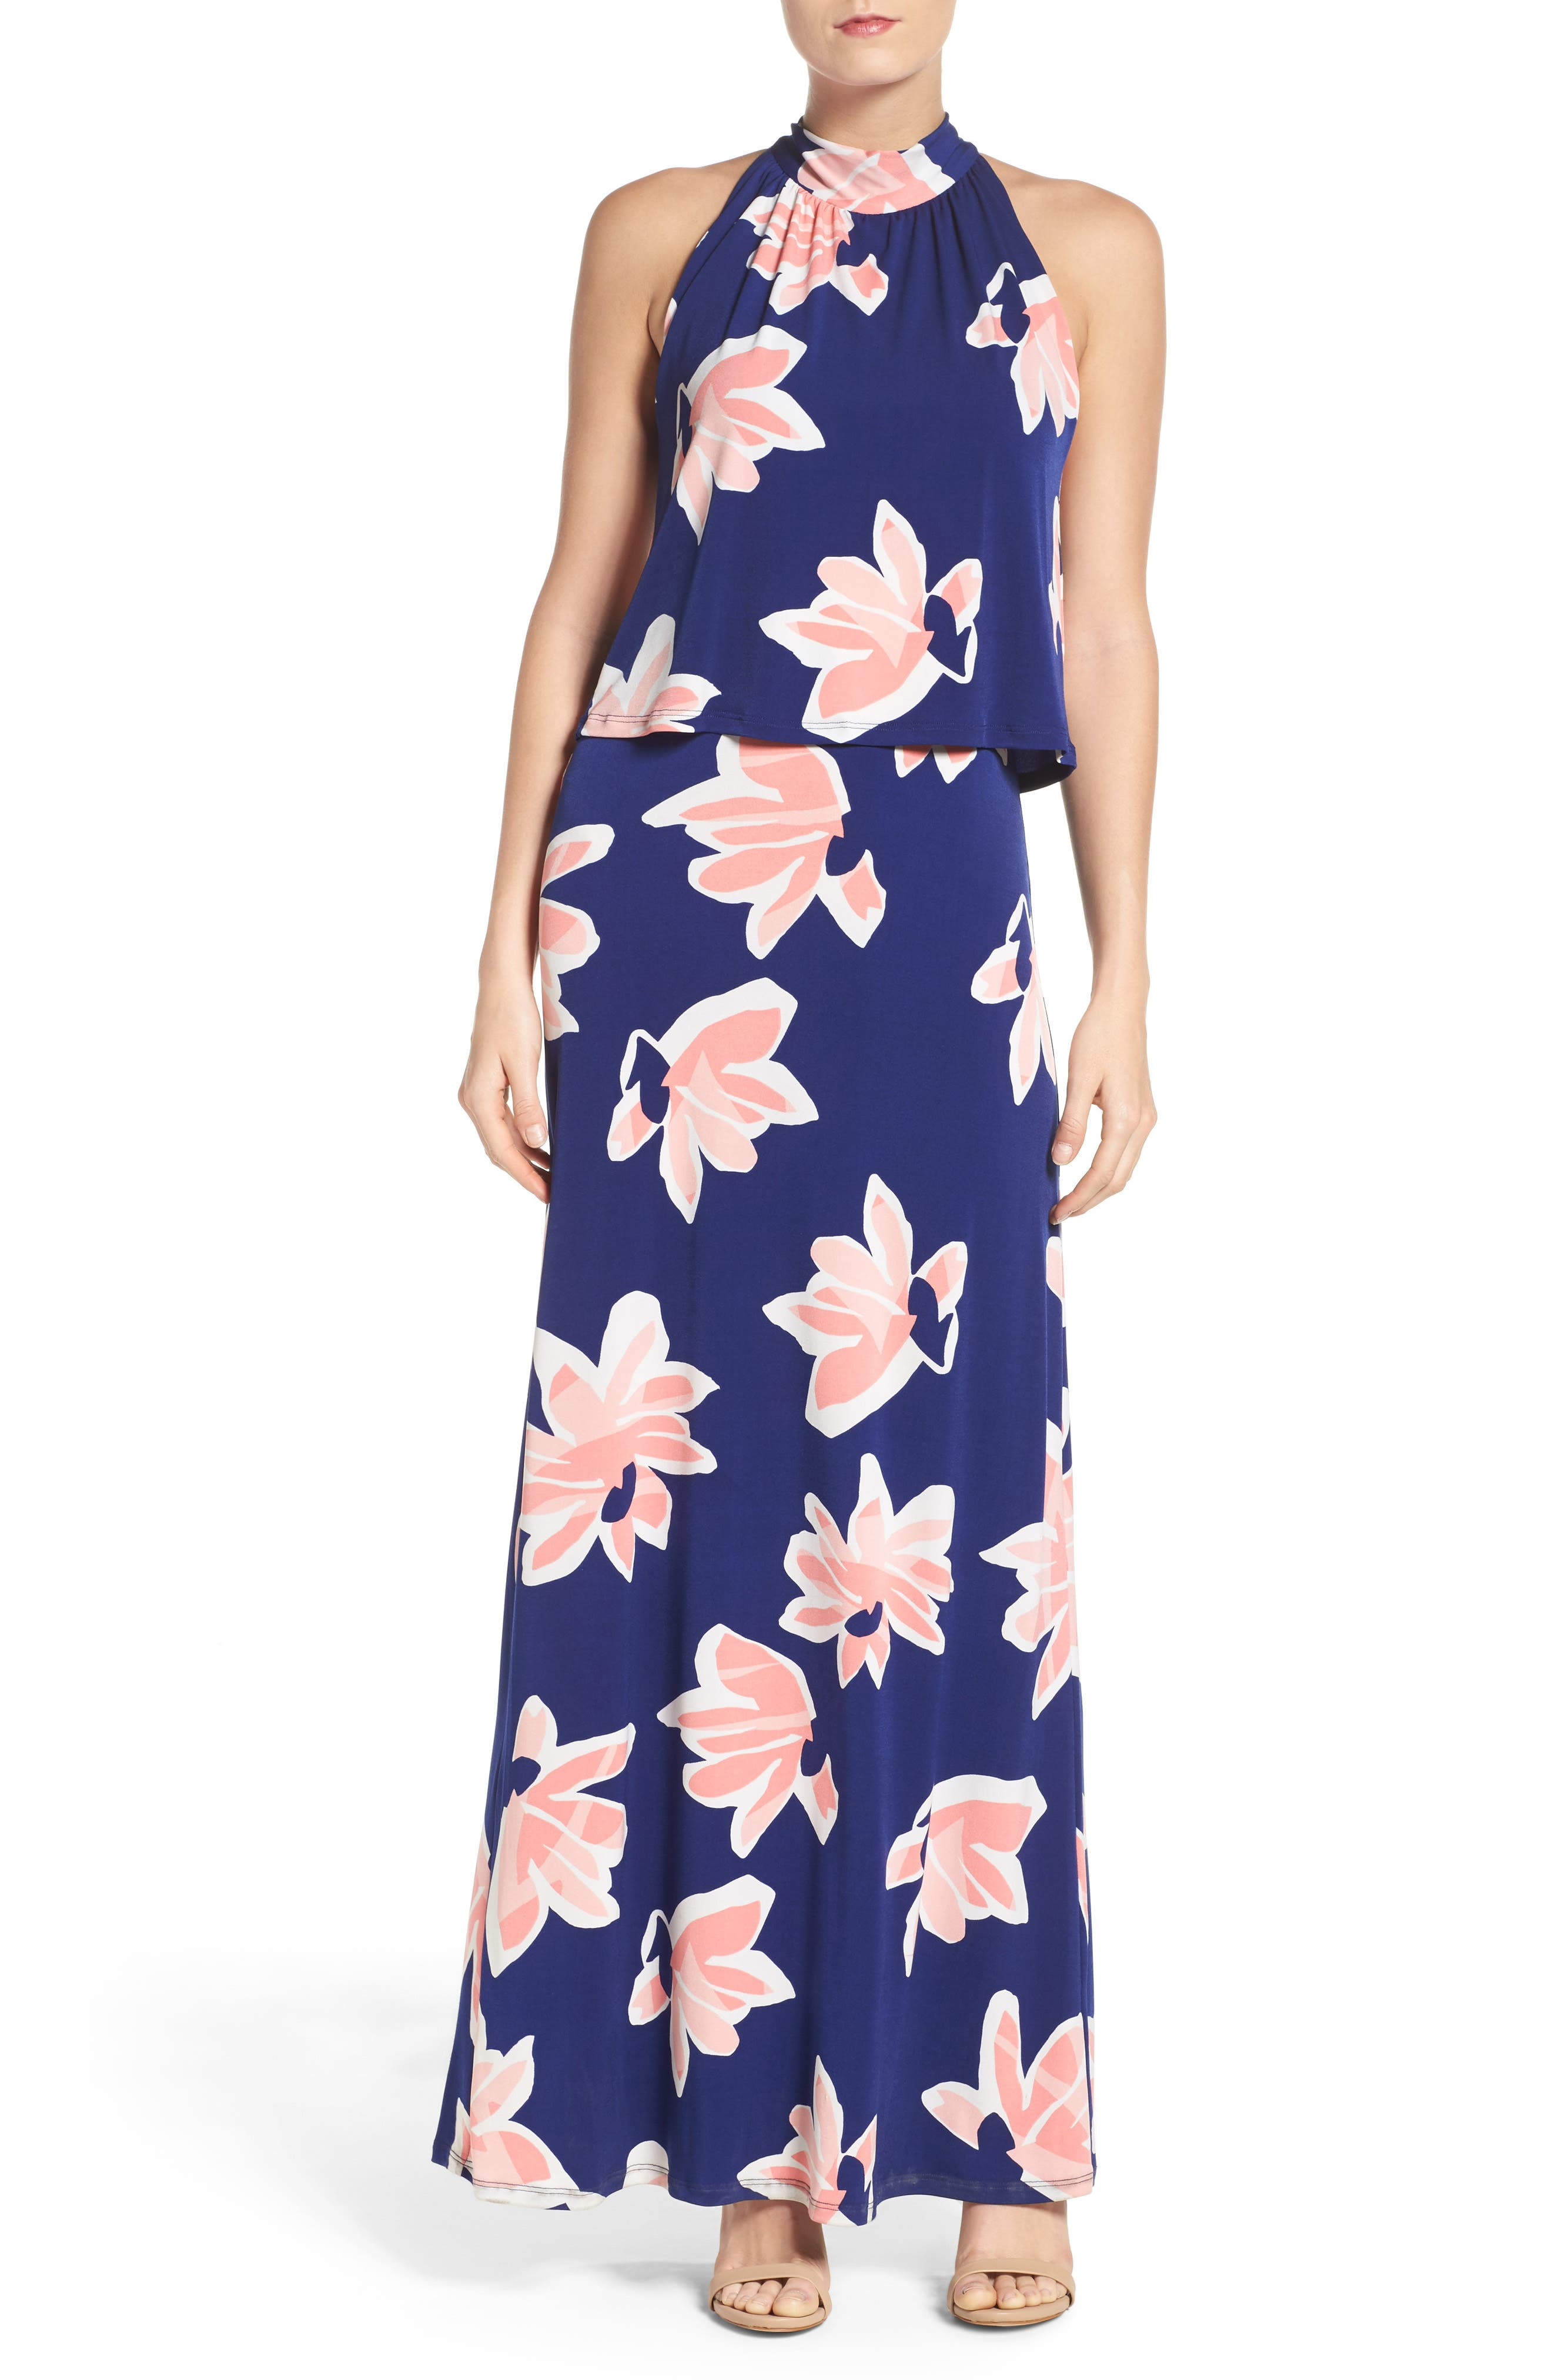 LEOTA Syler Popover Jersey Maxi Dress